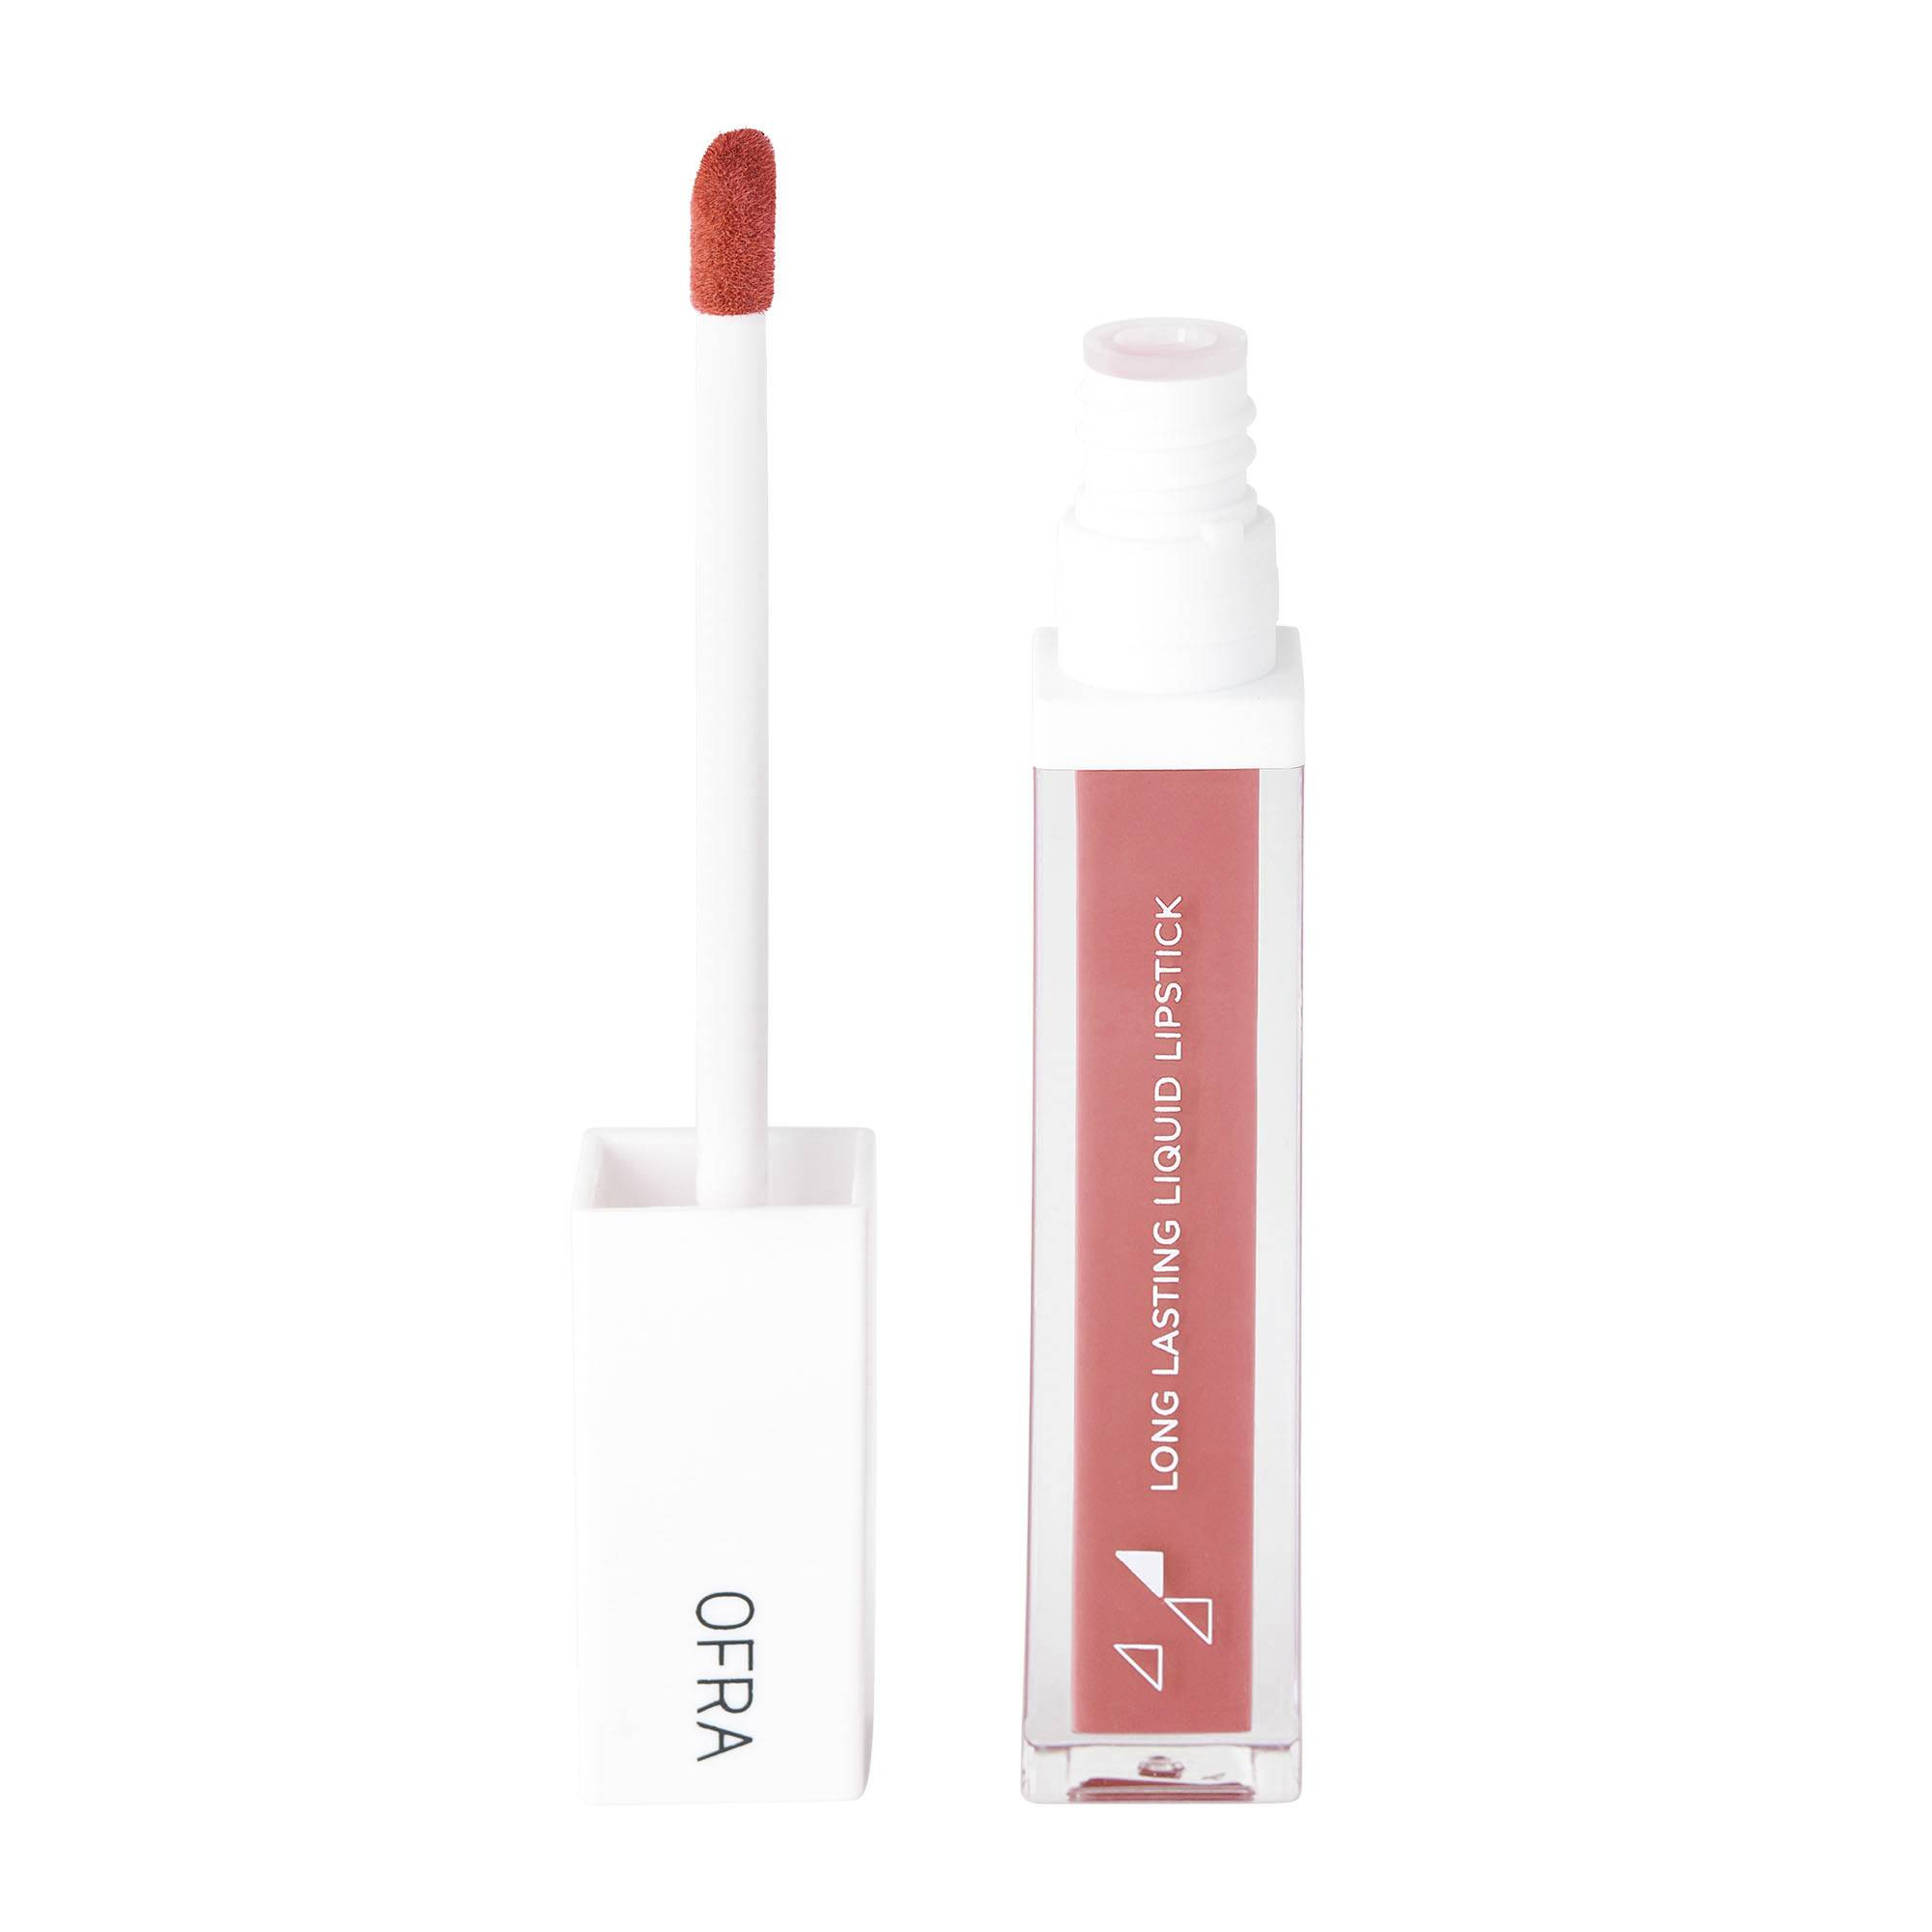 Ofra Long Lasting Liquid Lipstick Cocos Island